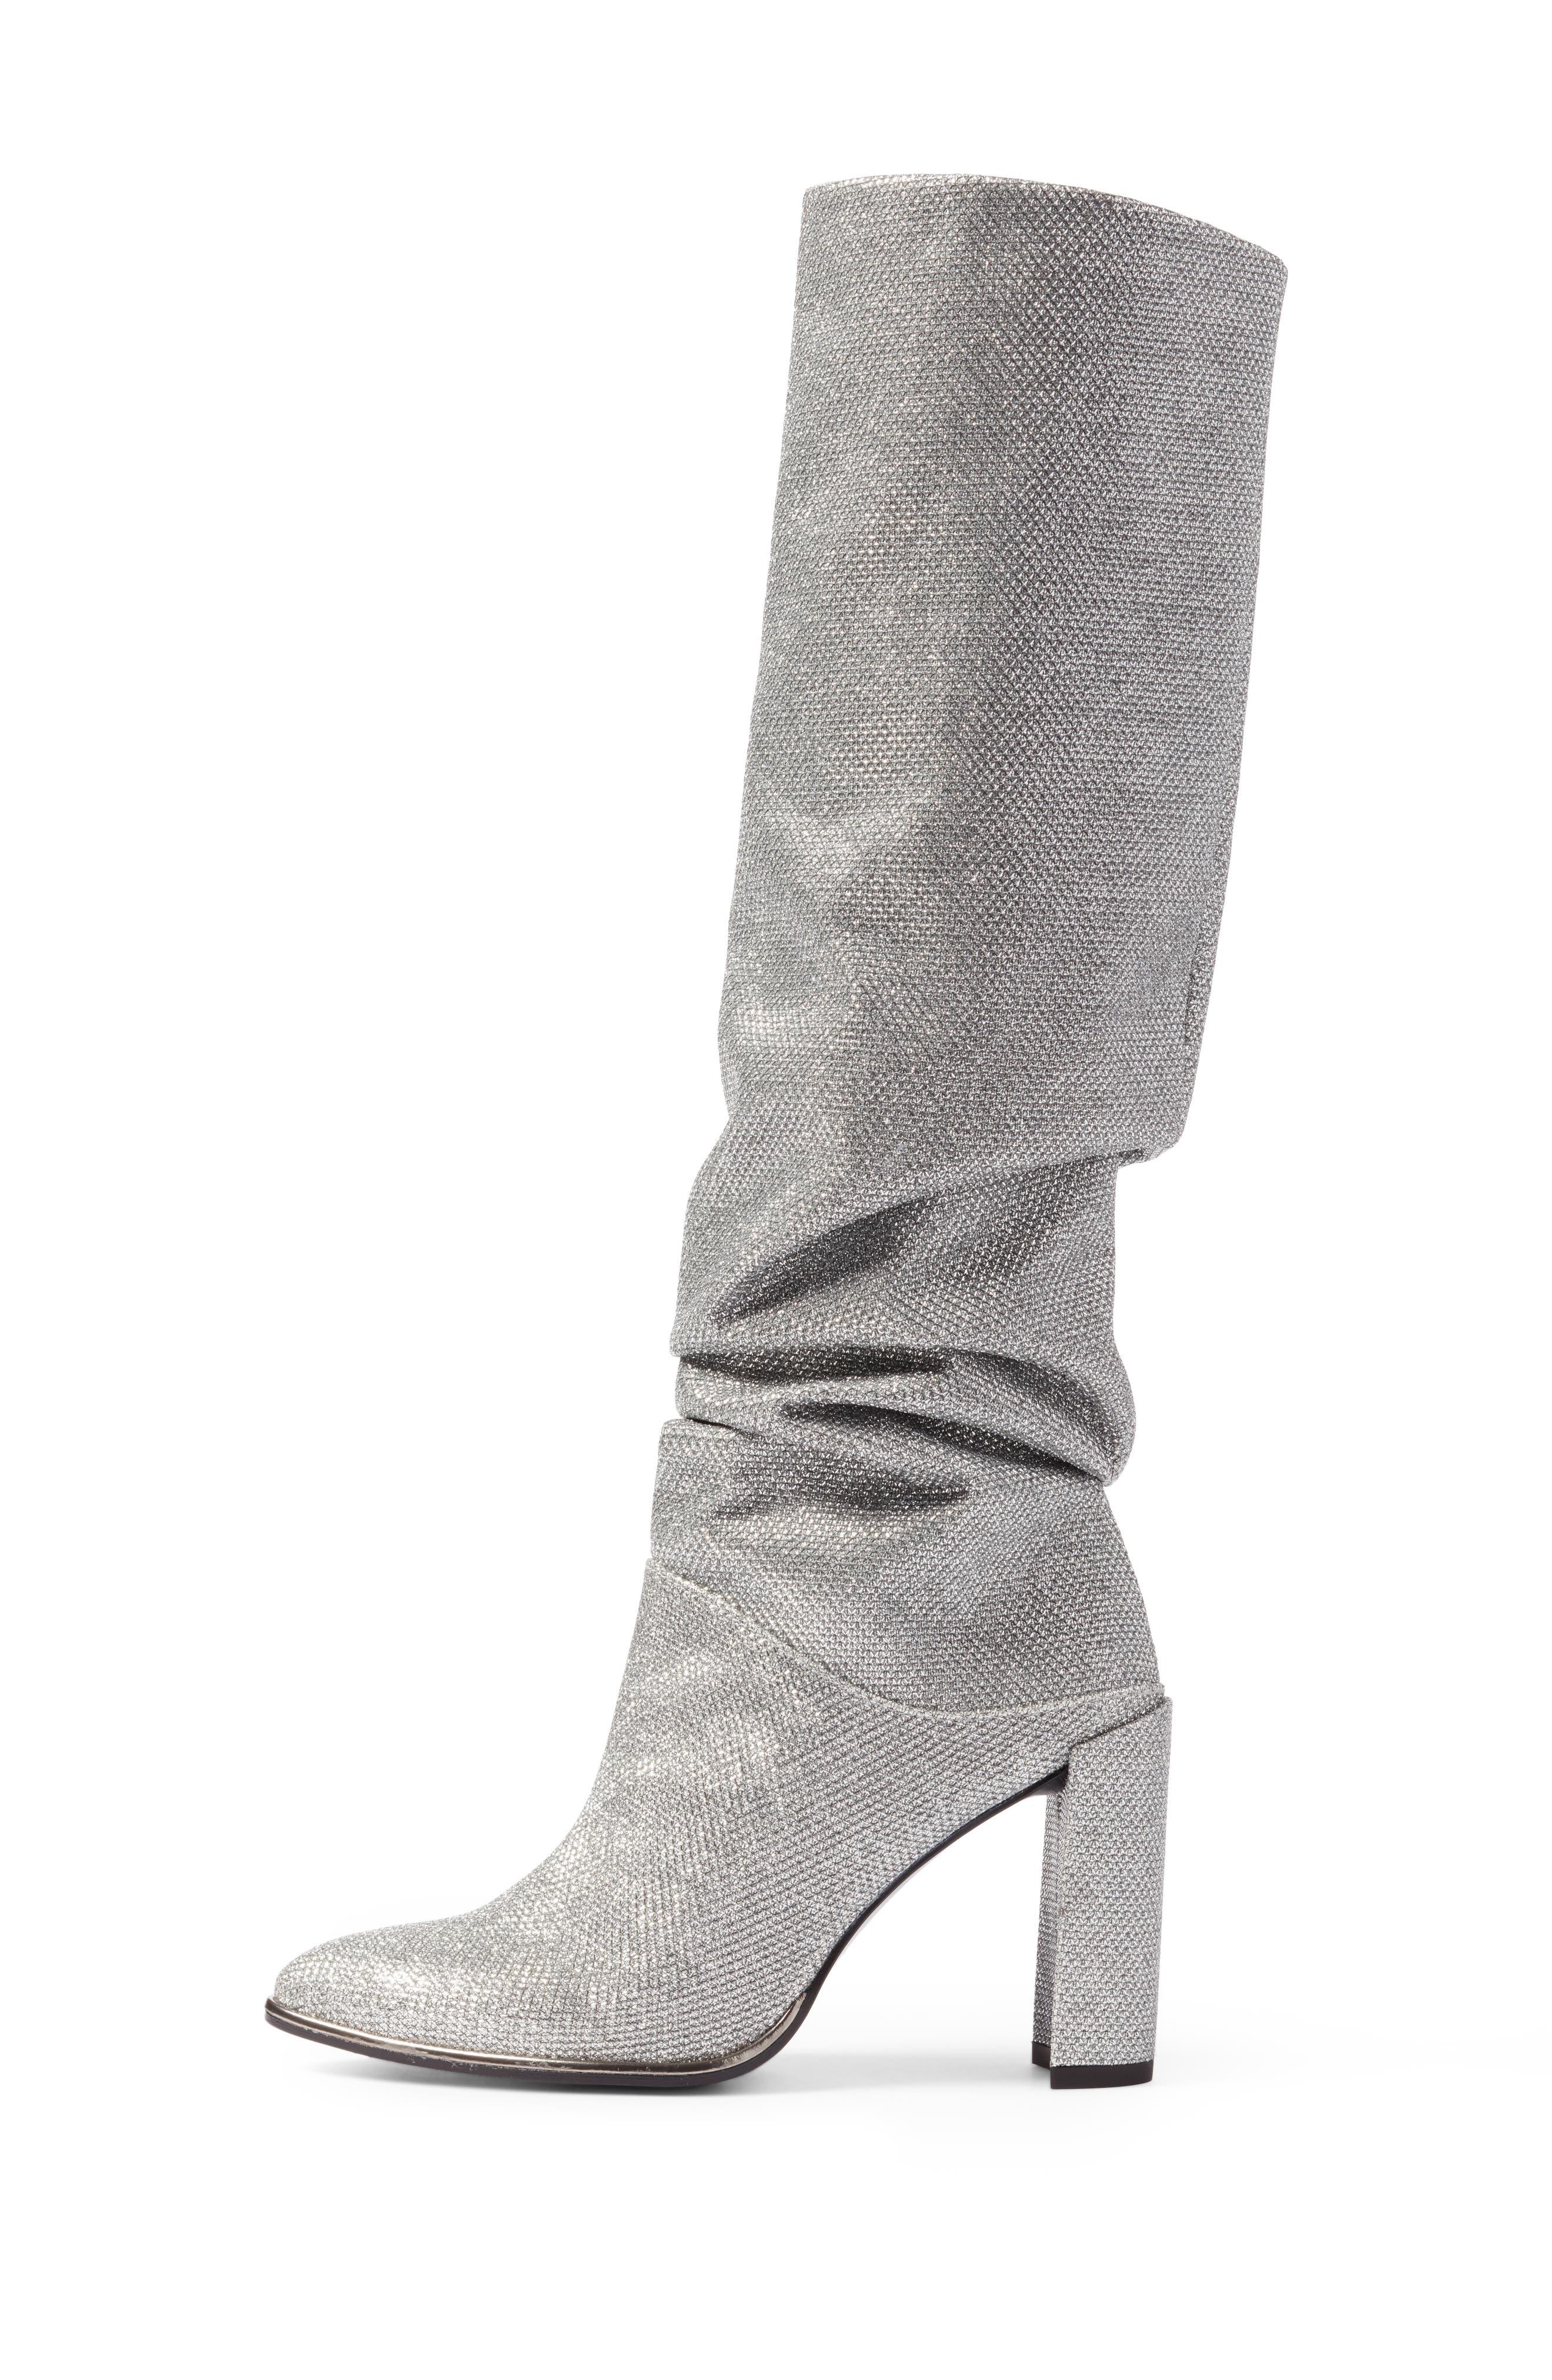 Alternate Image 3  - Stuart Weitzman Smashing Knee High Boot (Women)